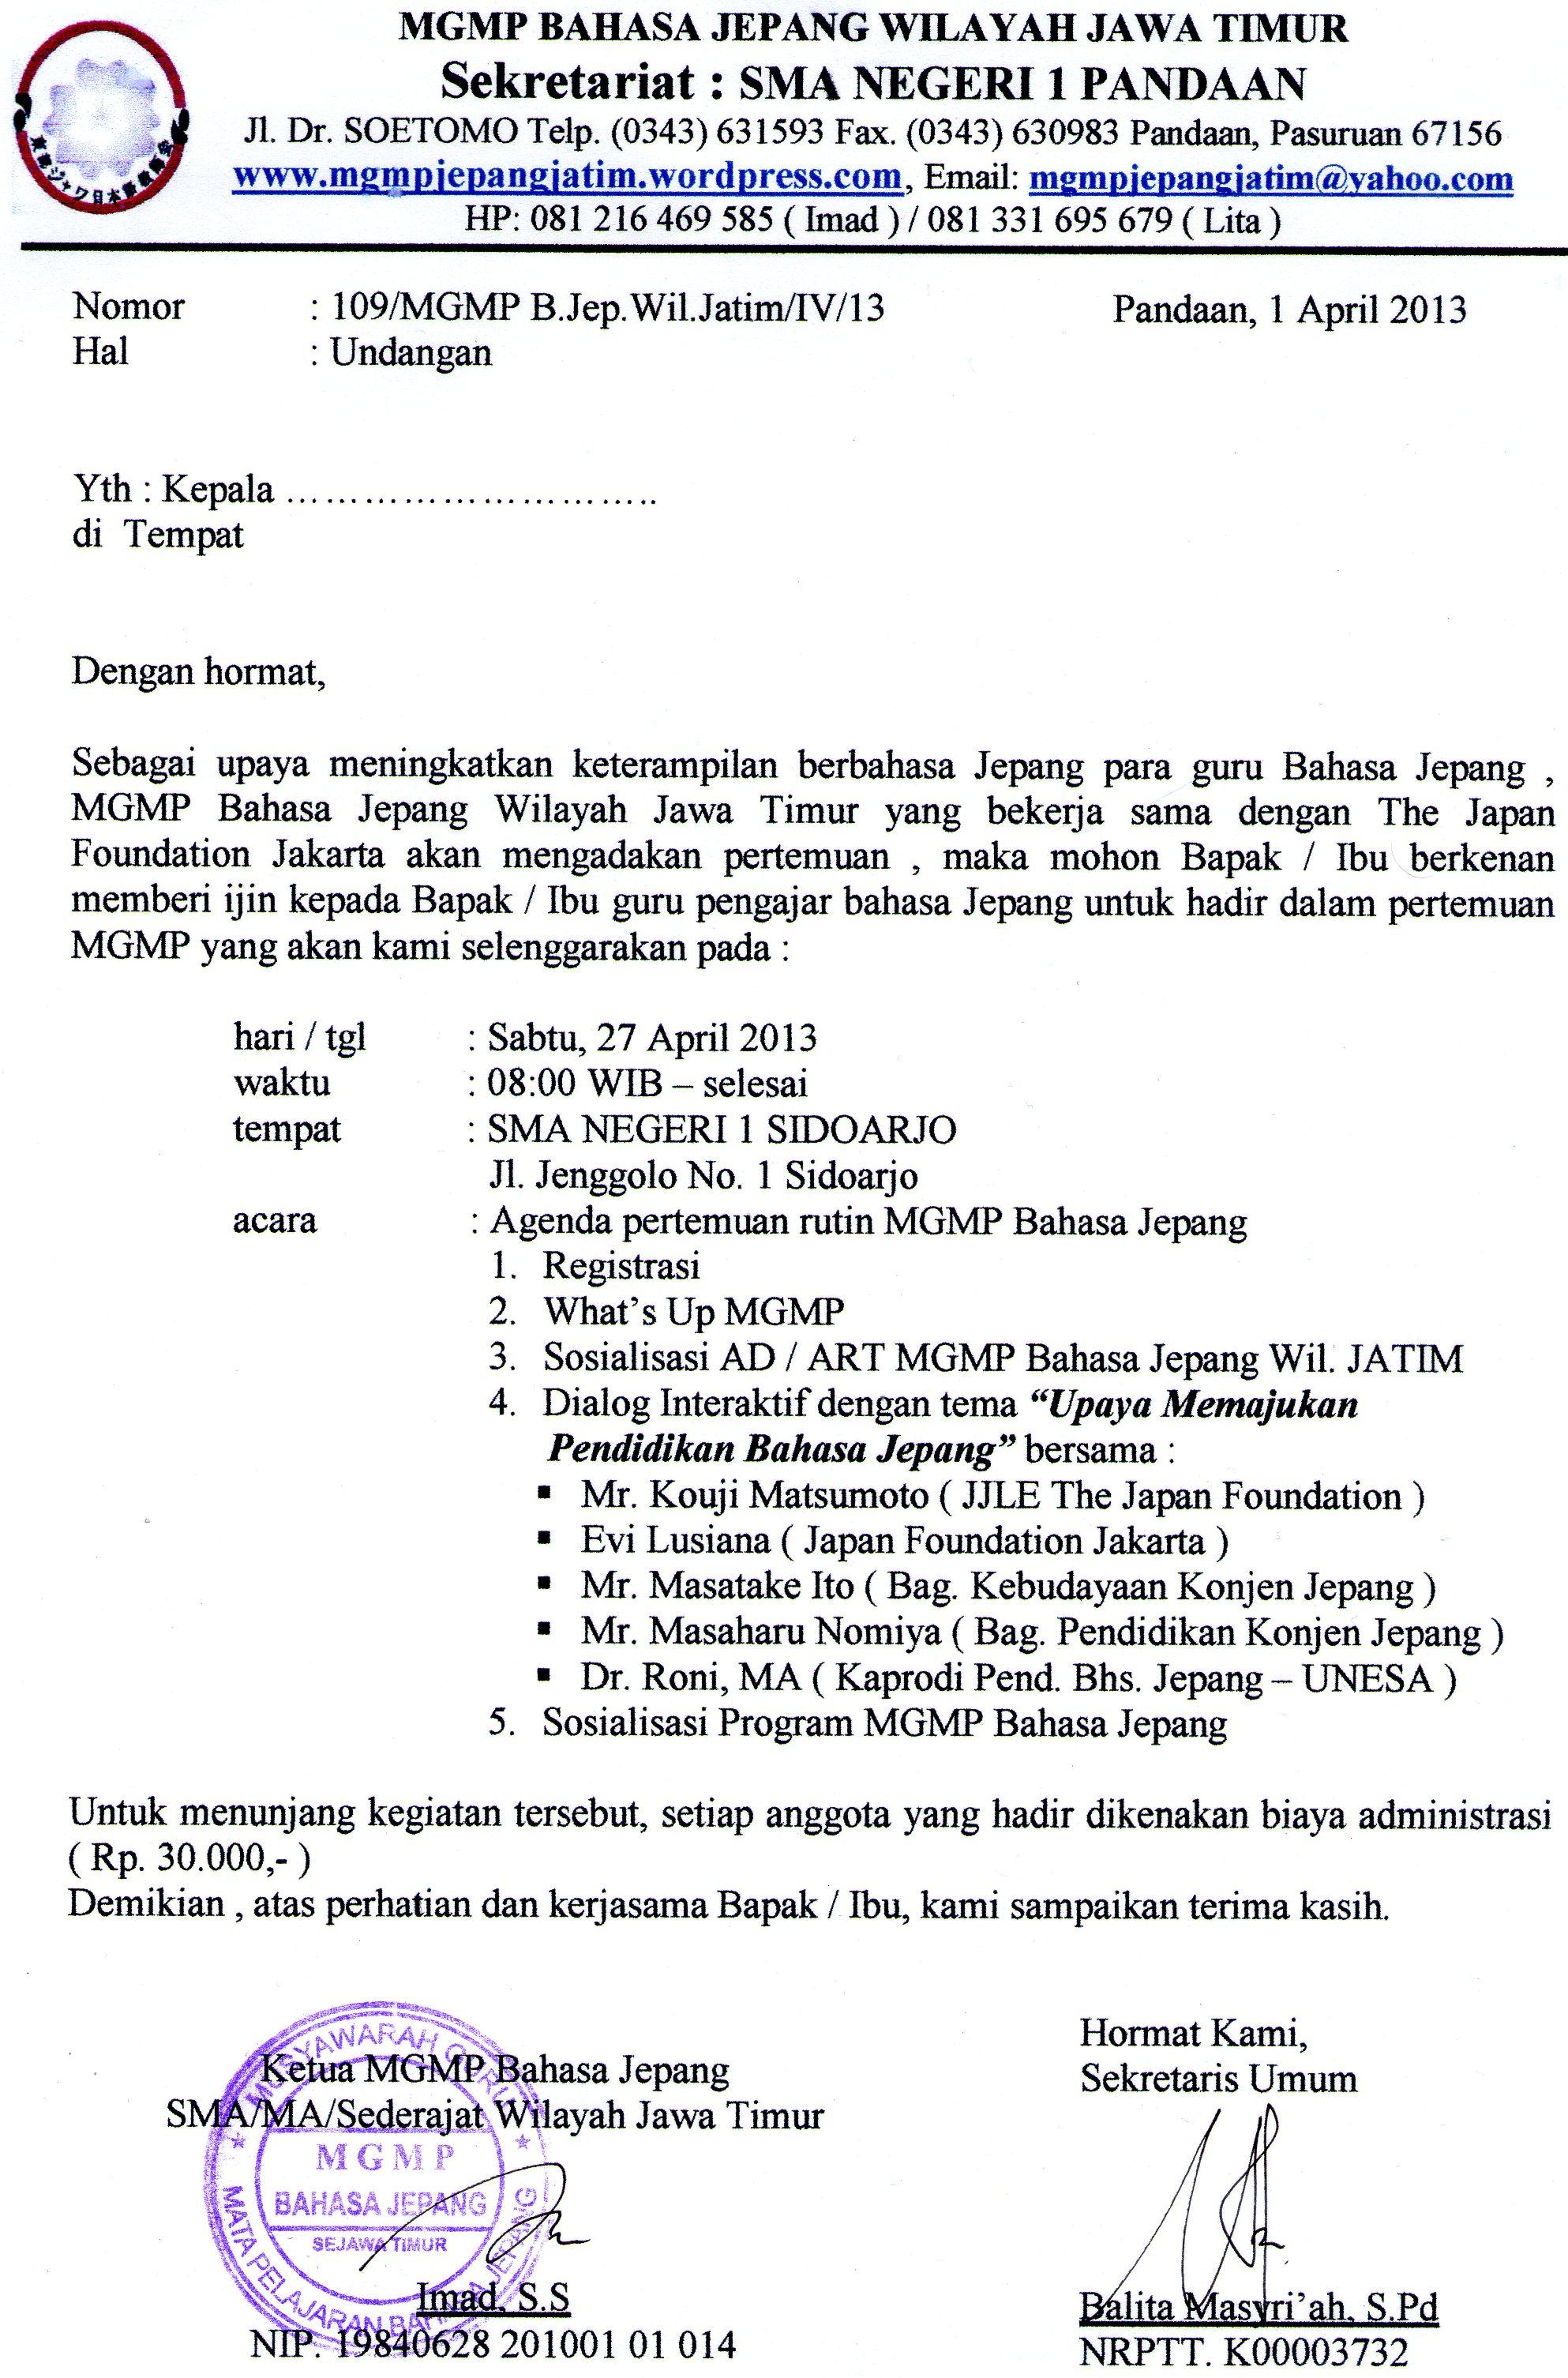 Beasiswa Bank Bulan Desember 2013 Beasiswa Indonesian Education Attach In London Japan05multiply Istikumawordpress20… Mgmpjepangjatim